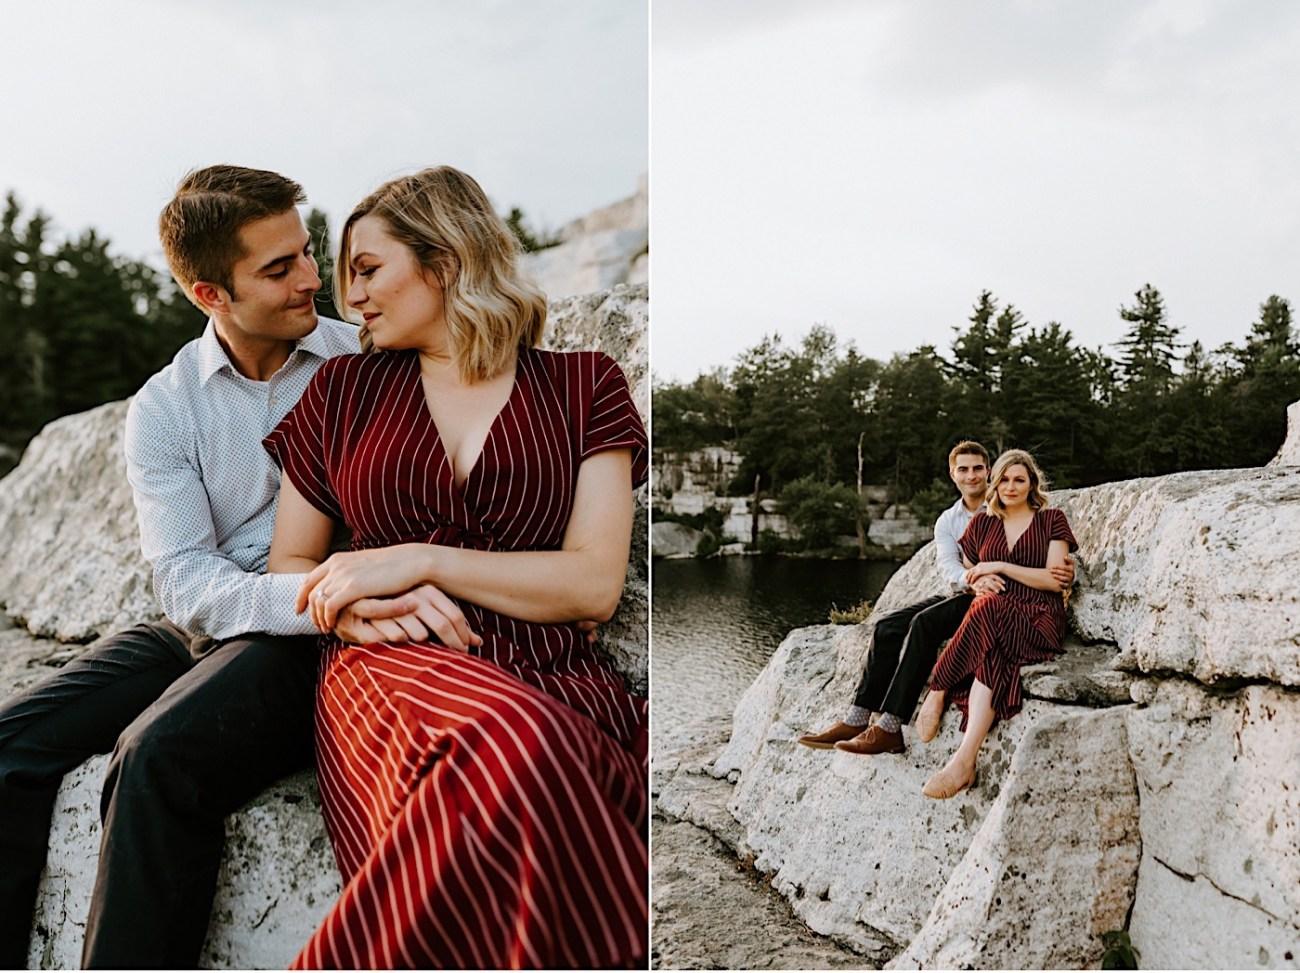 Minnewaska Engagement Session New York Wedding Photographer Hudson Valley Wedding Catskill Weddingphotographer 31